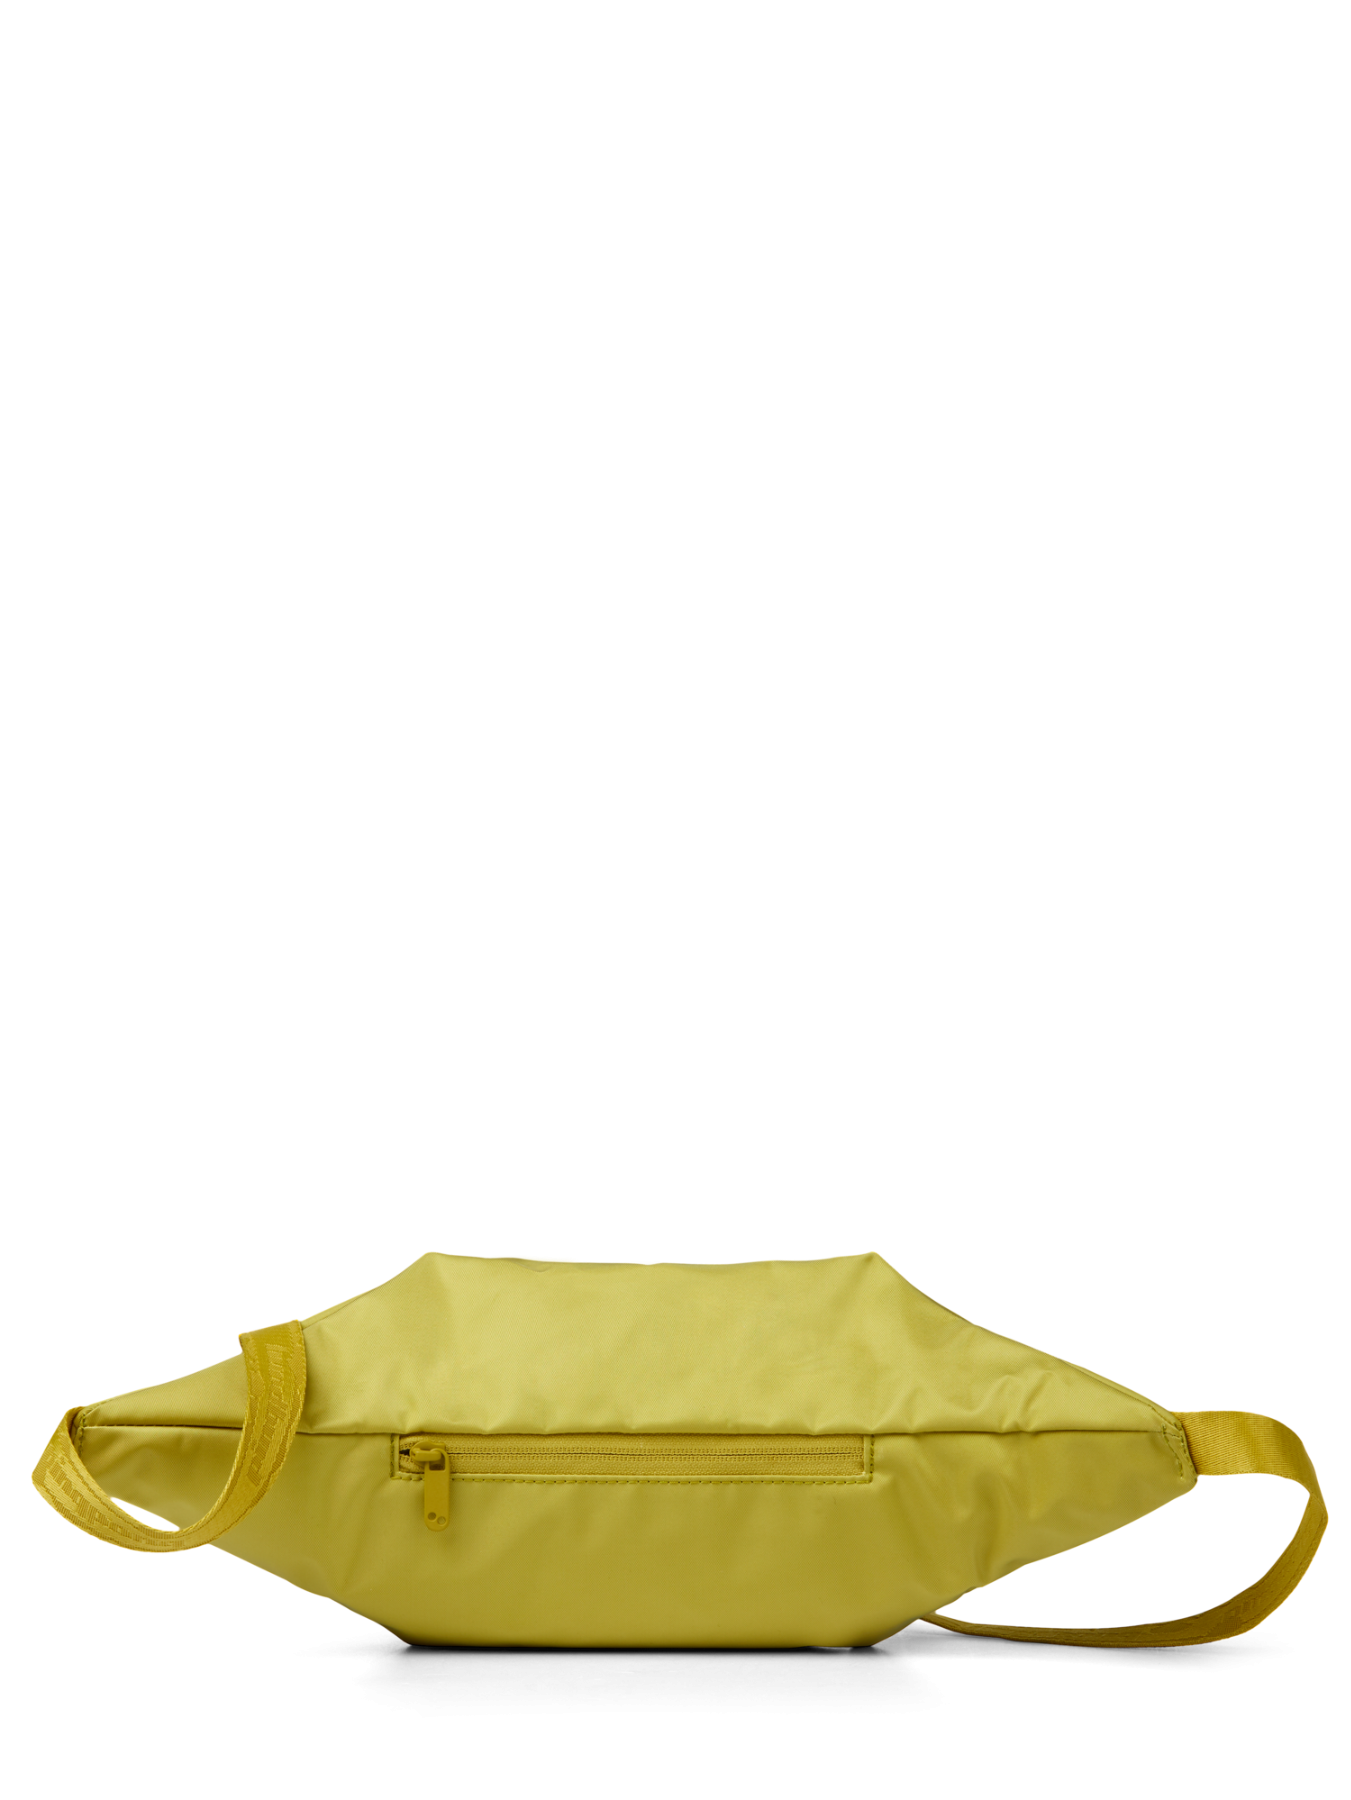 pinqponq Hipbag BRIK - polished Gold